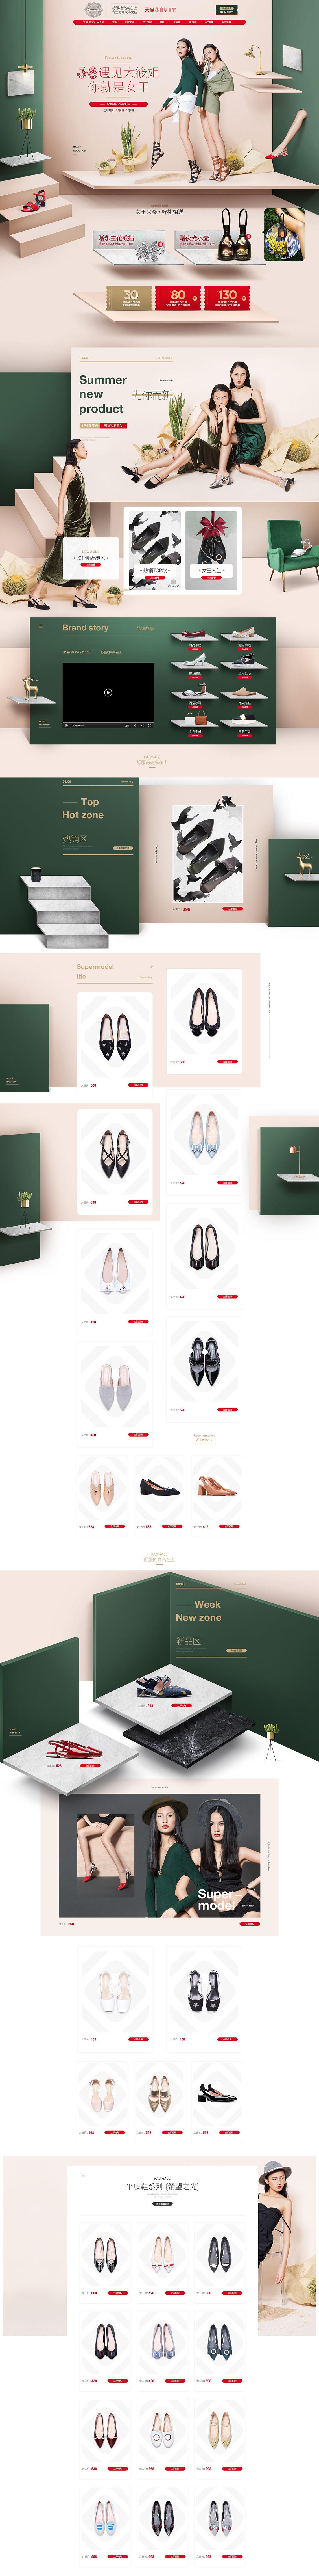 kasmase女鞋女士皮鞋靴子 天貓女王節 38婦女節 天貓首頁活動專題頁面設計